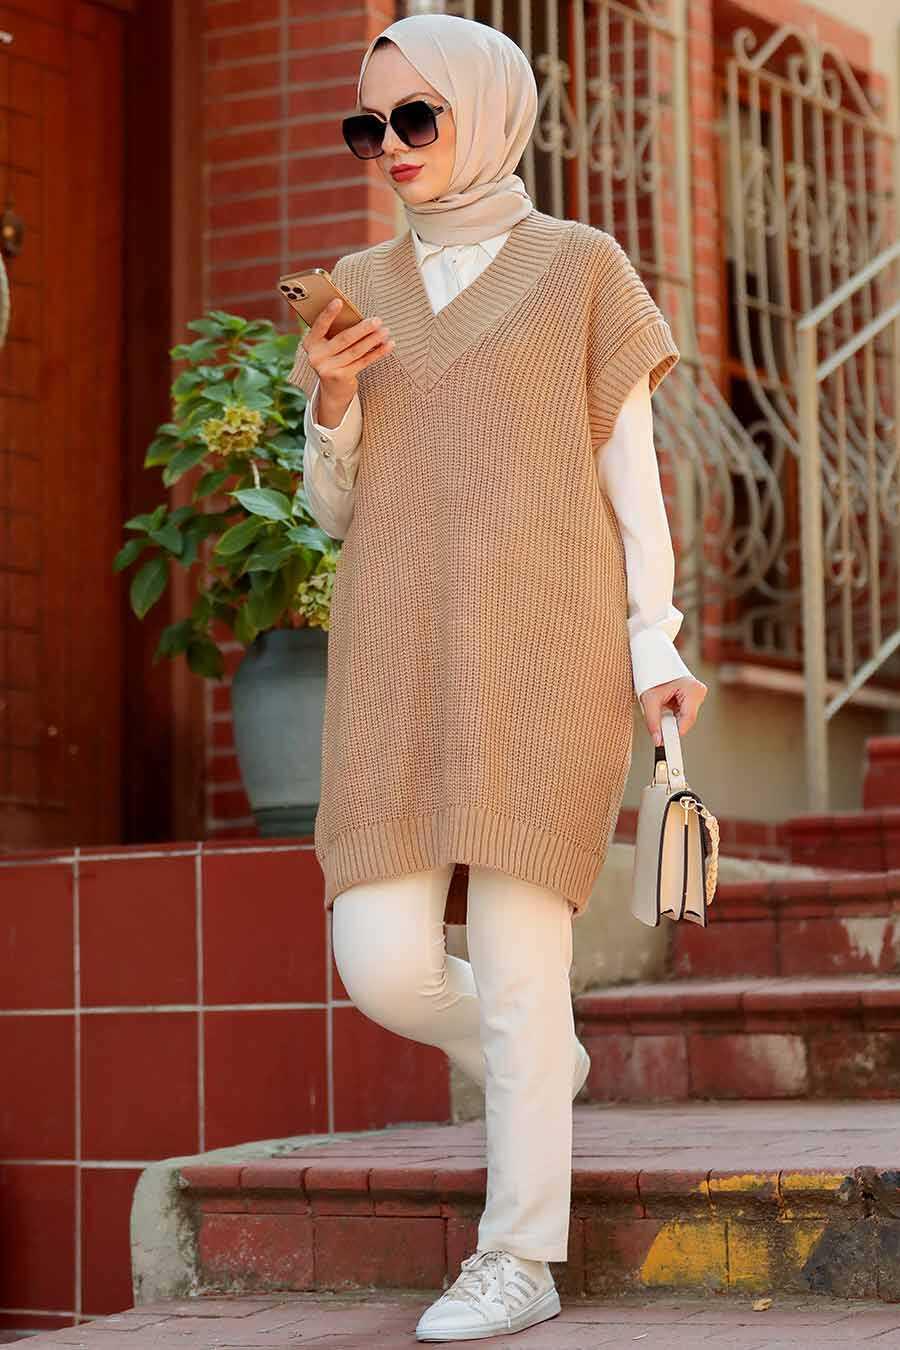 Biscuit Hijab Knitwear Sweater 7836BS